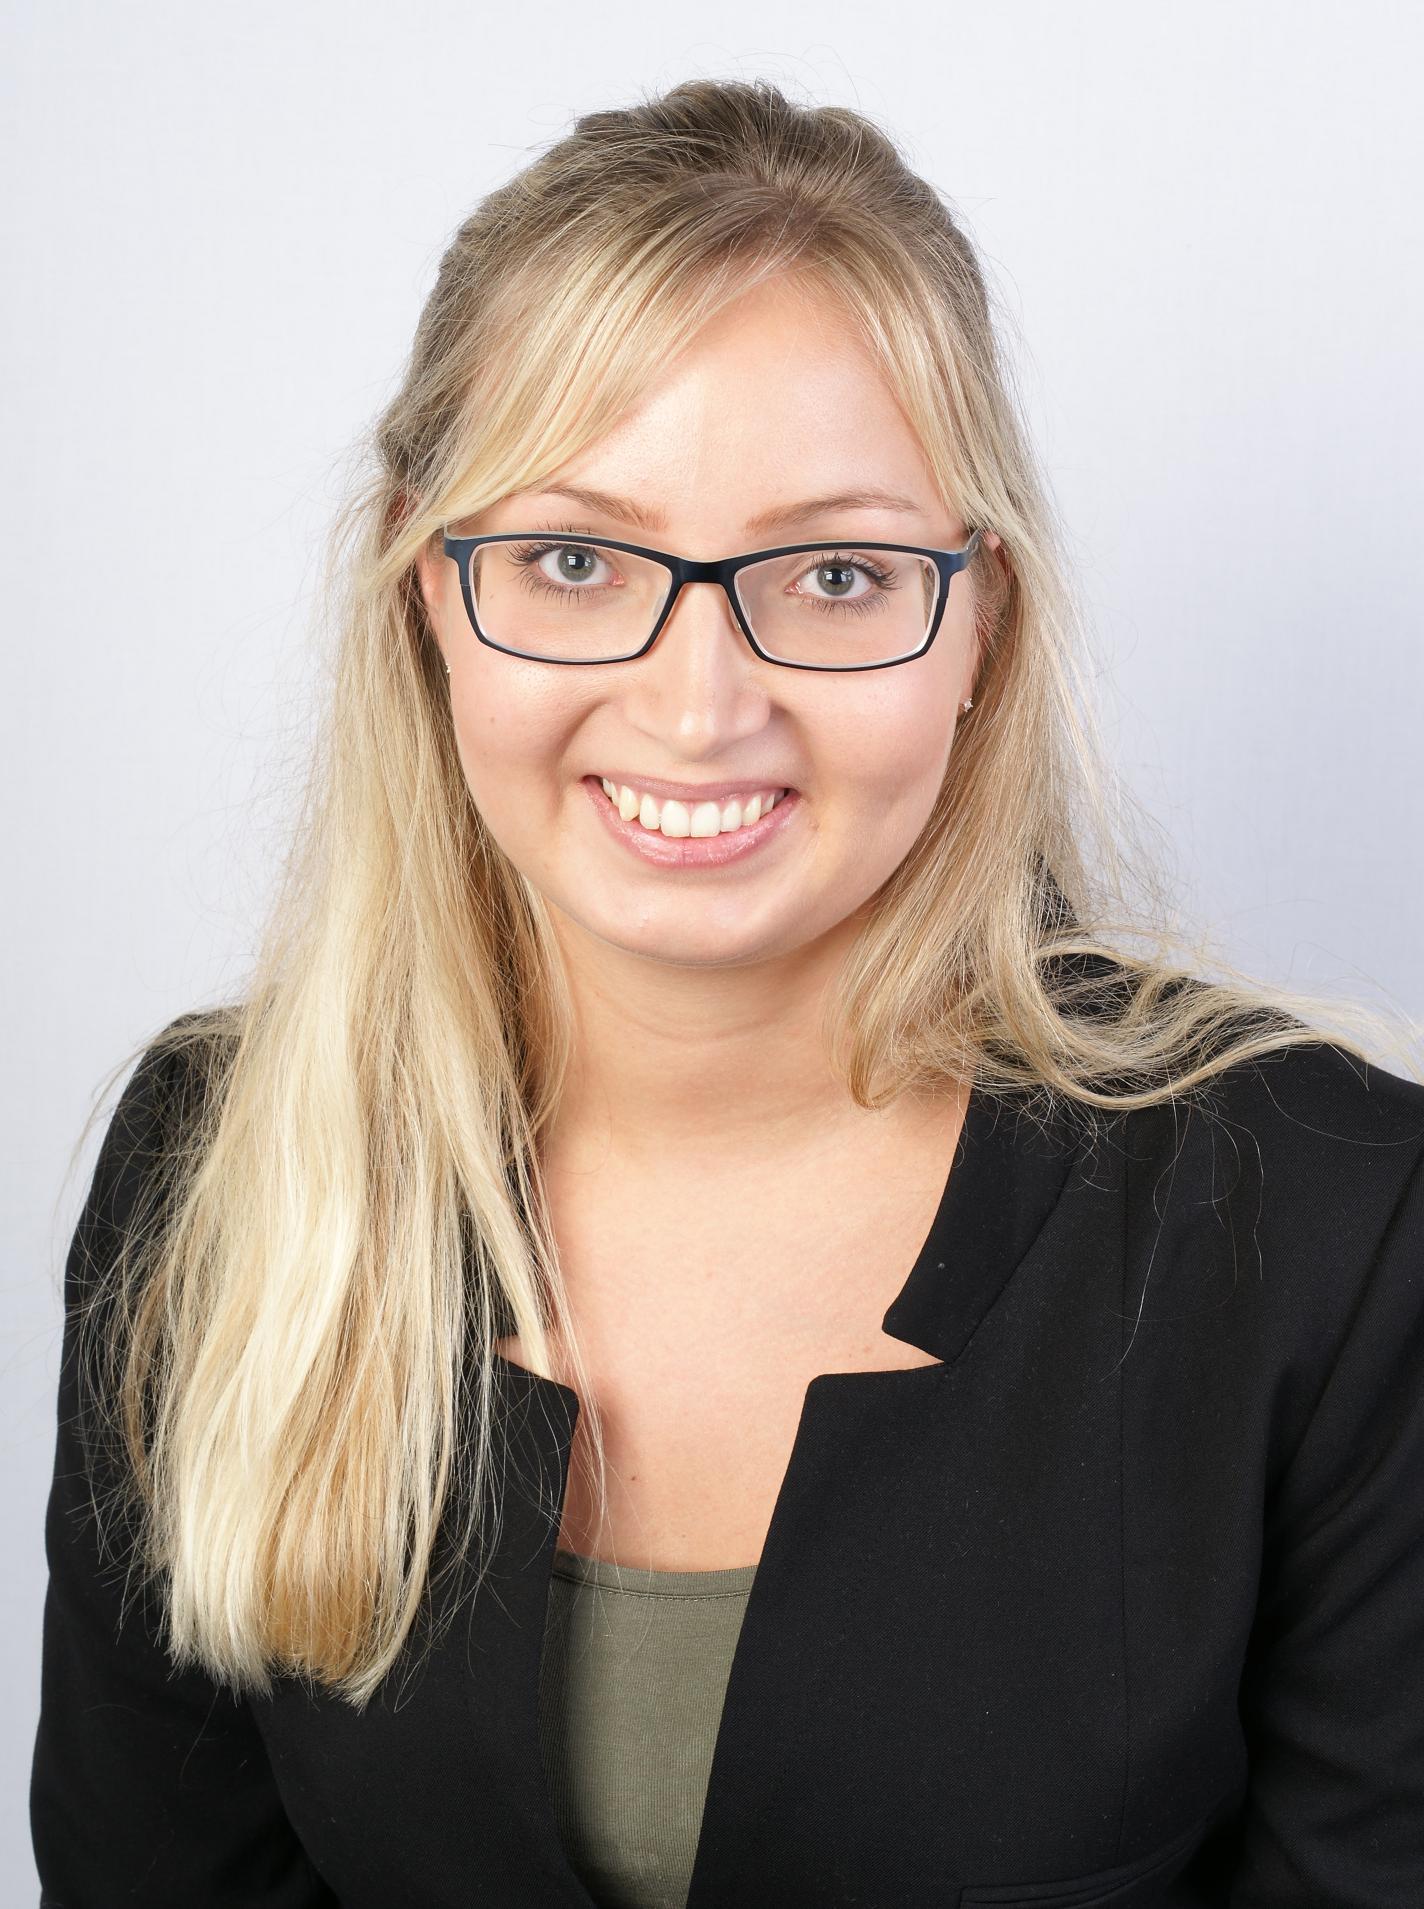 Lisa Ann Hald